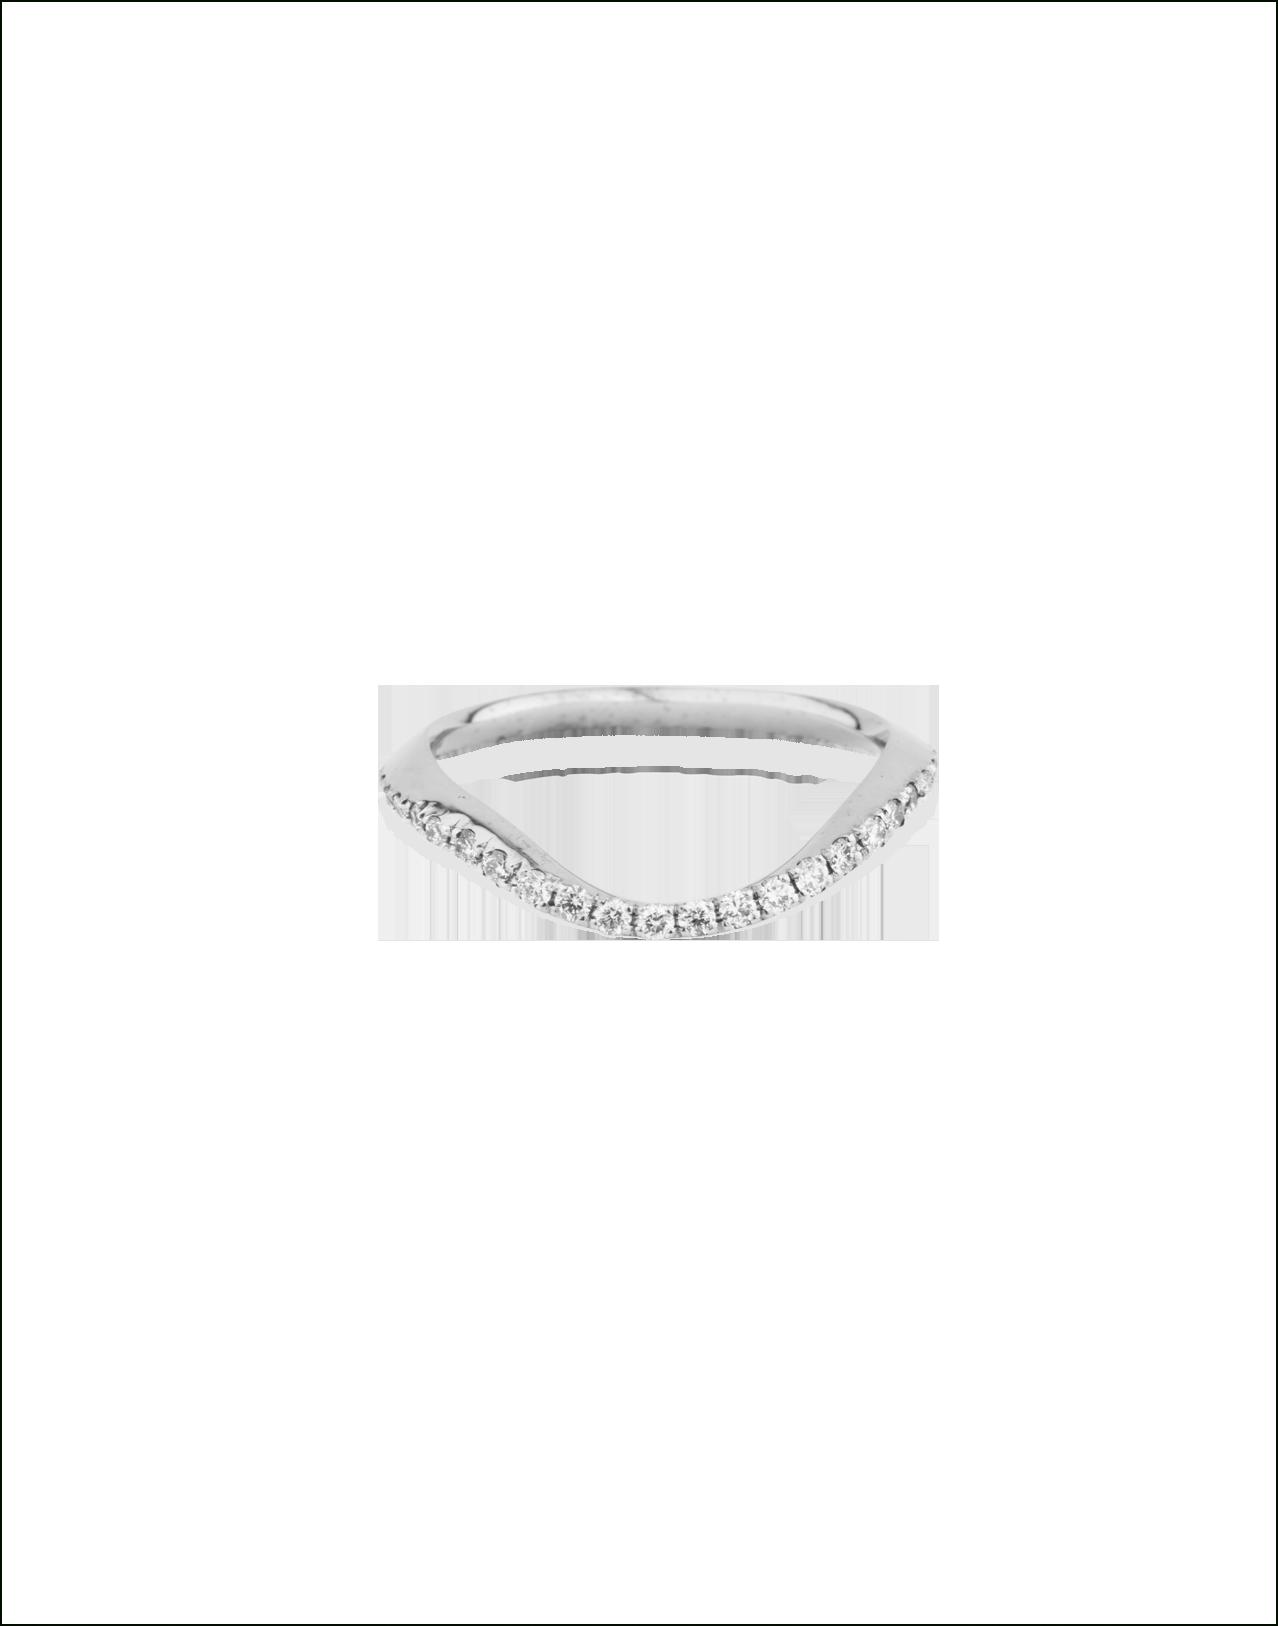 Completedworks-Wedding-Band-Wave-Gold-Ring-4-1.png